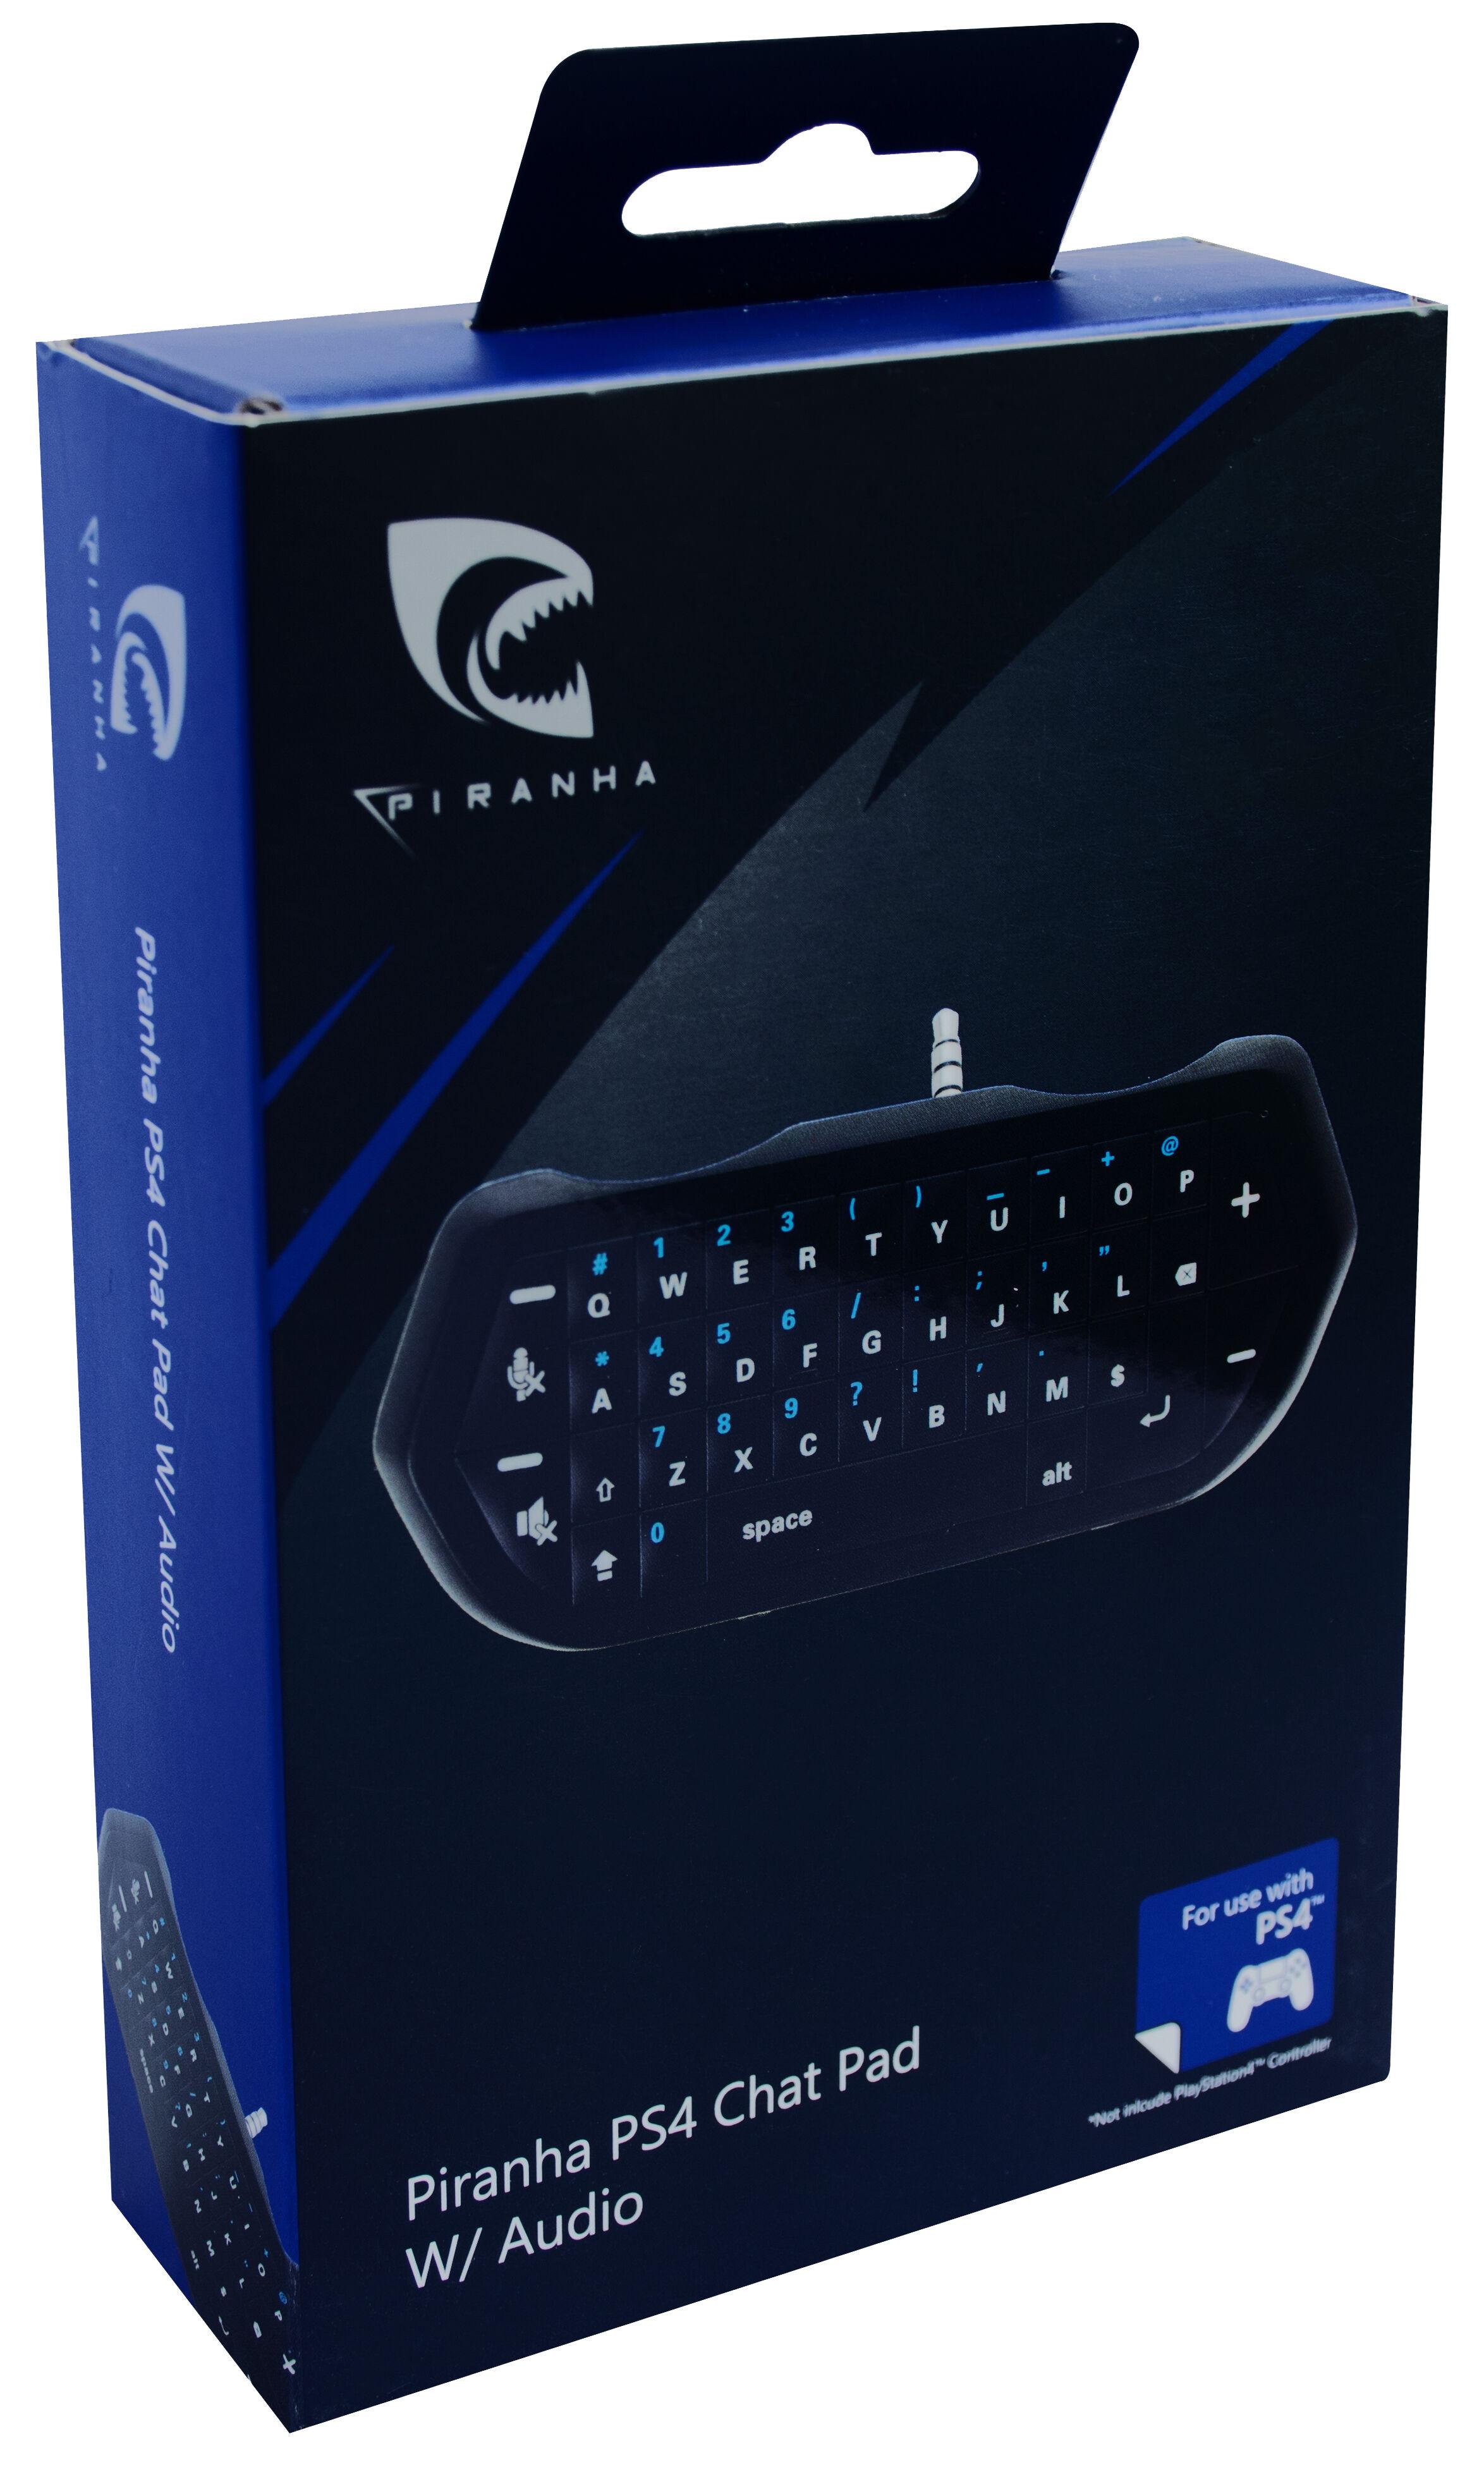 Piranha PS4 Chat Pad w/audio